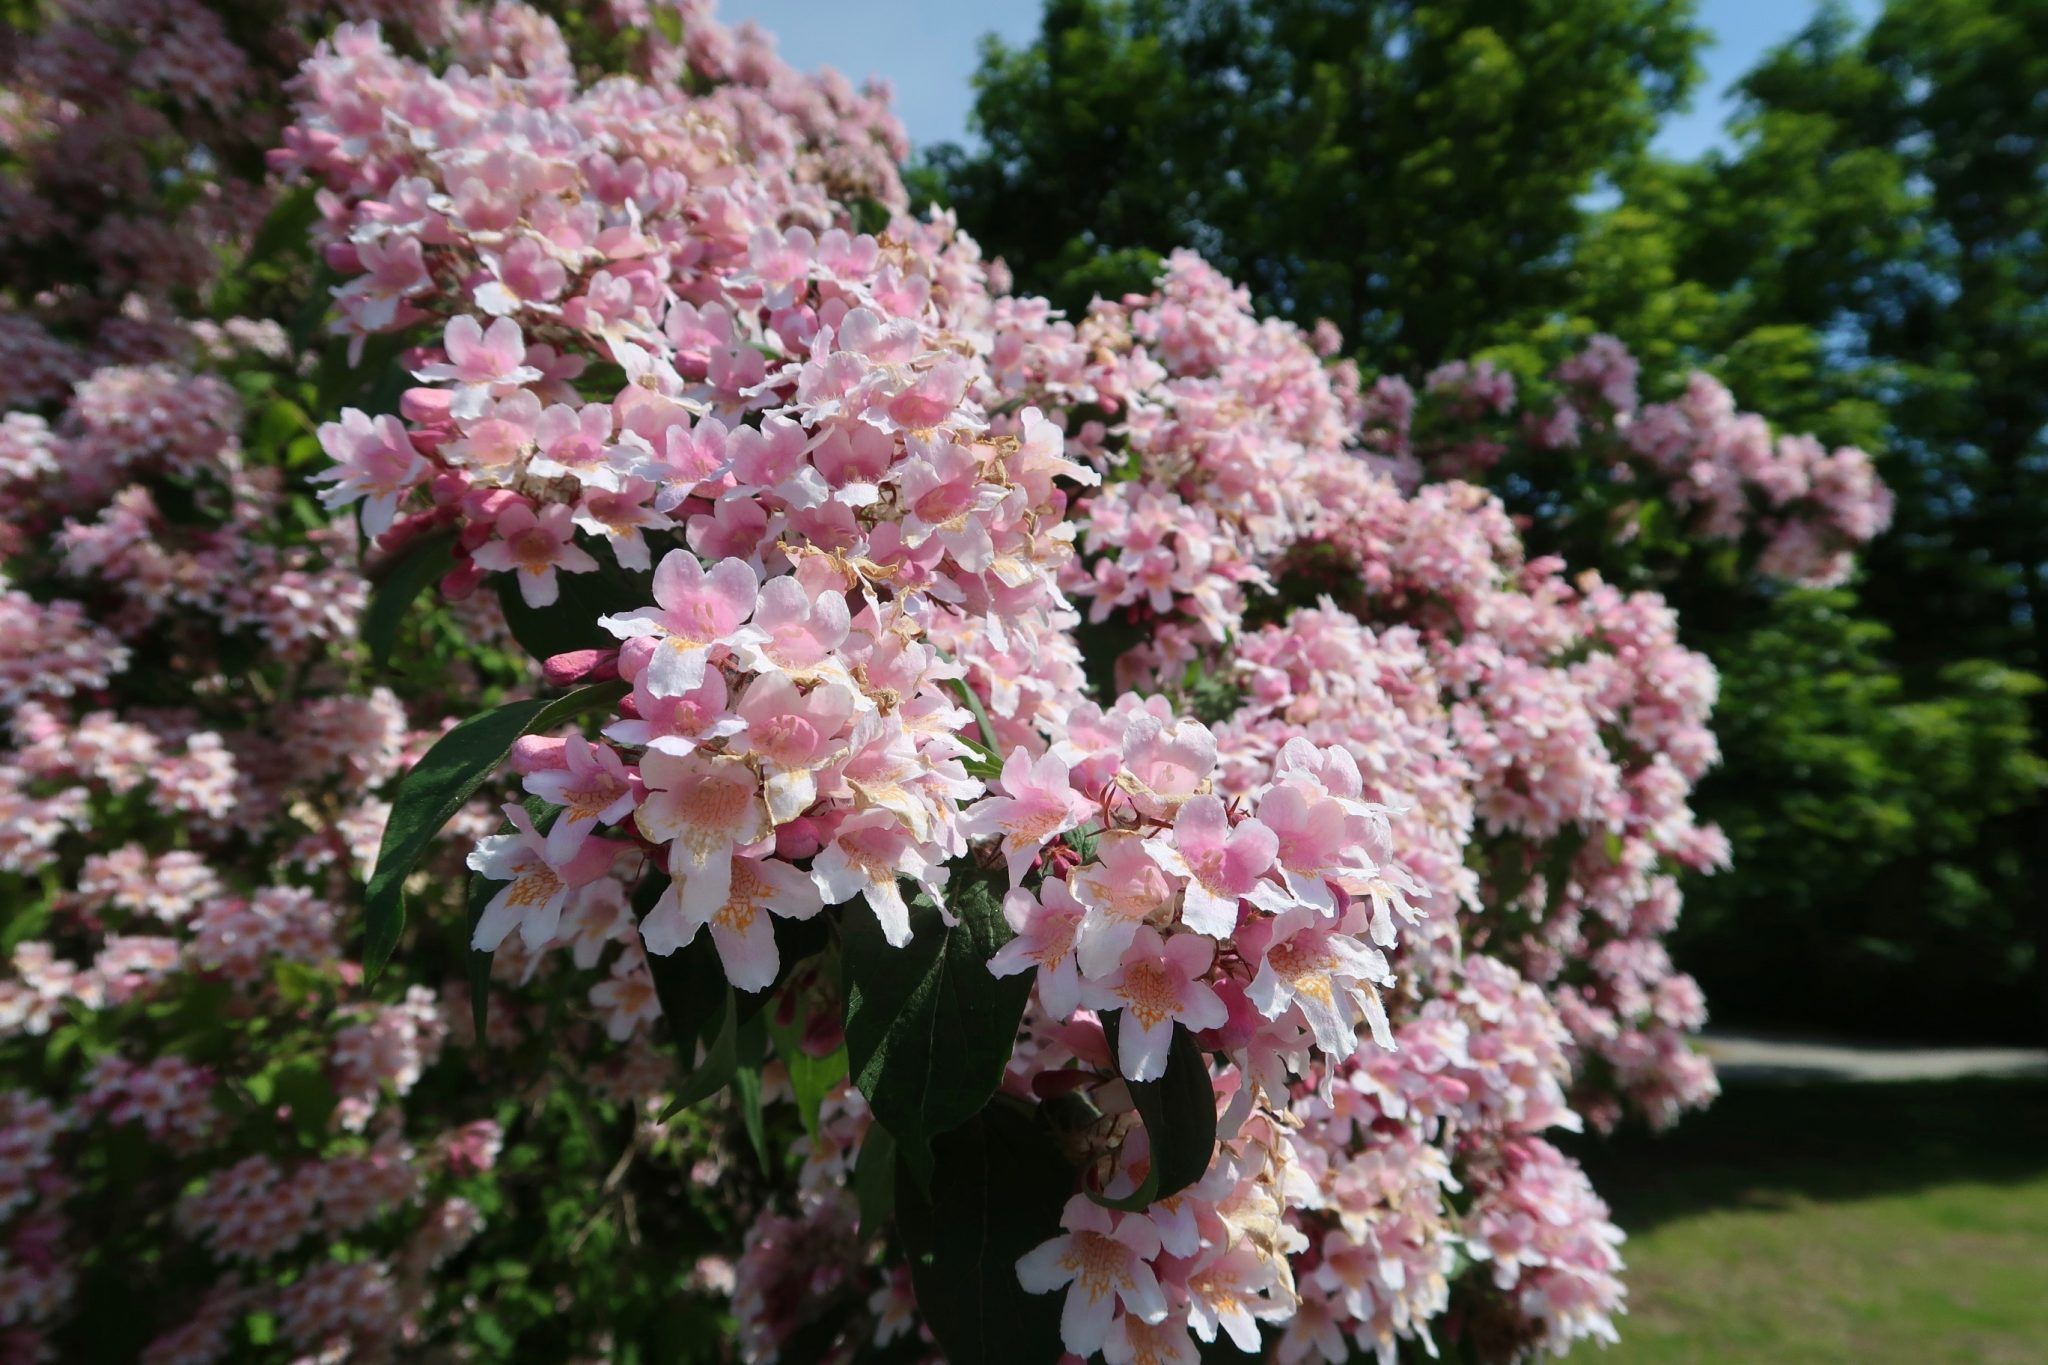 Tukholma Bromma kukat